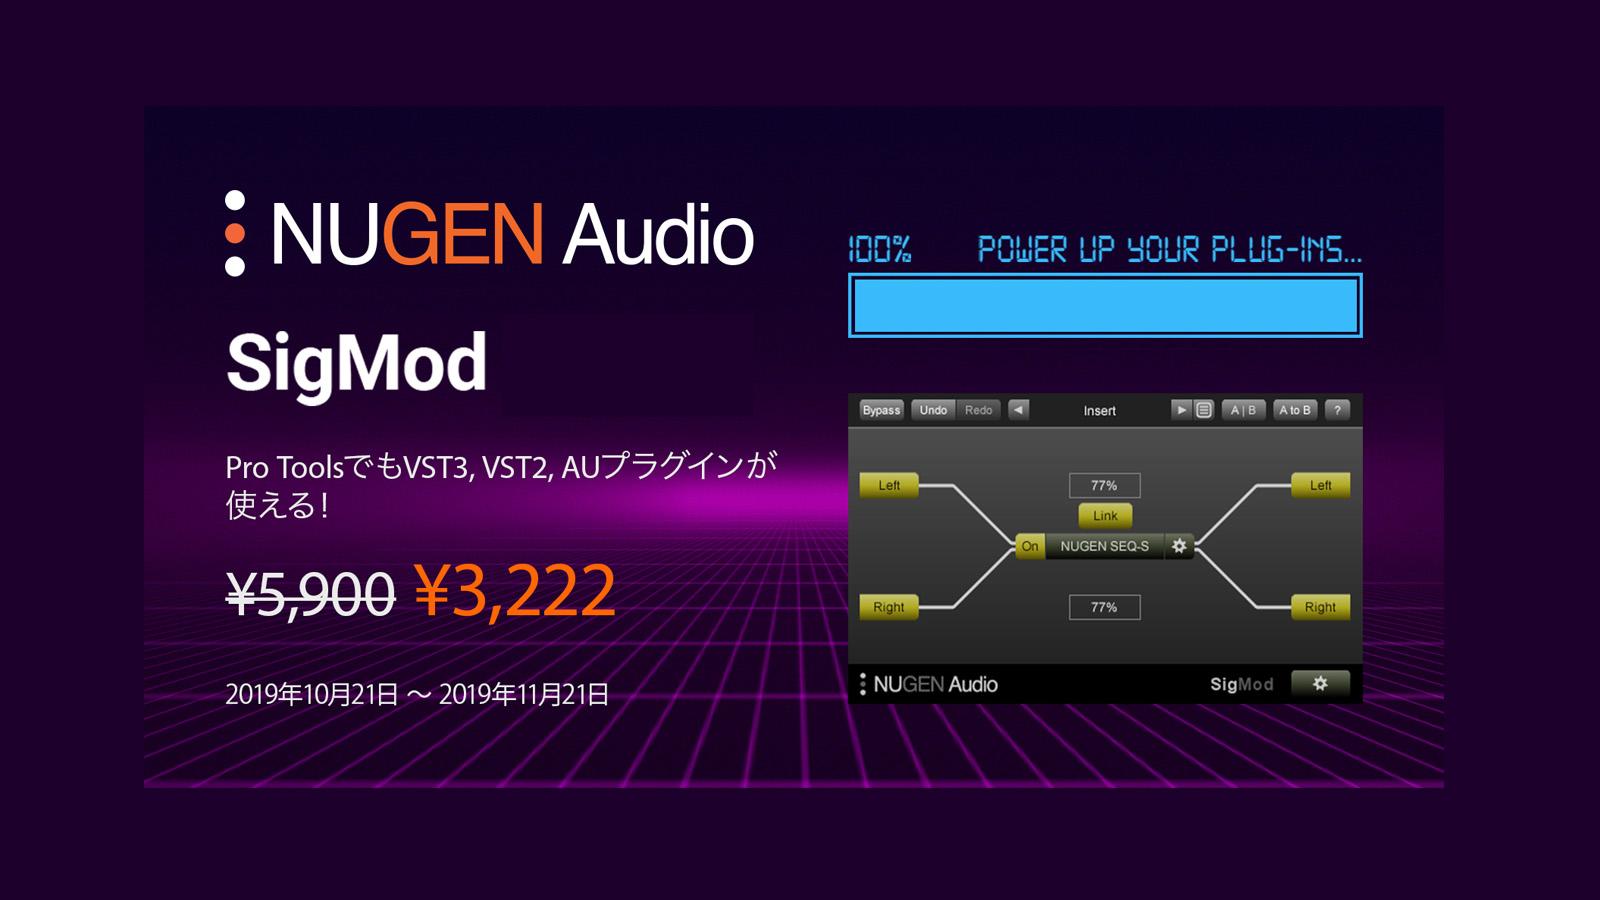 VST3、VST2、AUプラグインをあらゆるDAWで使えるようになる、Nugen Audio SigModが45%OFF!